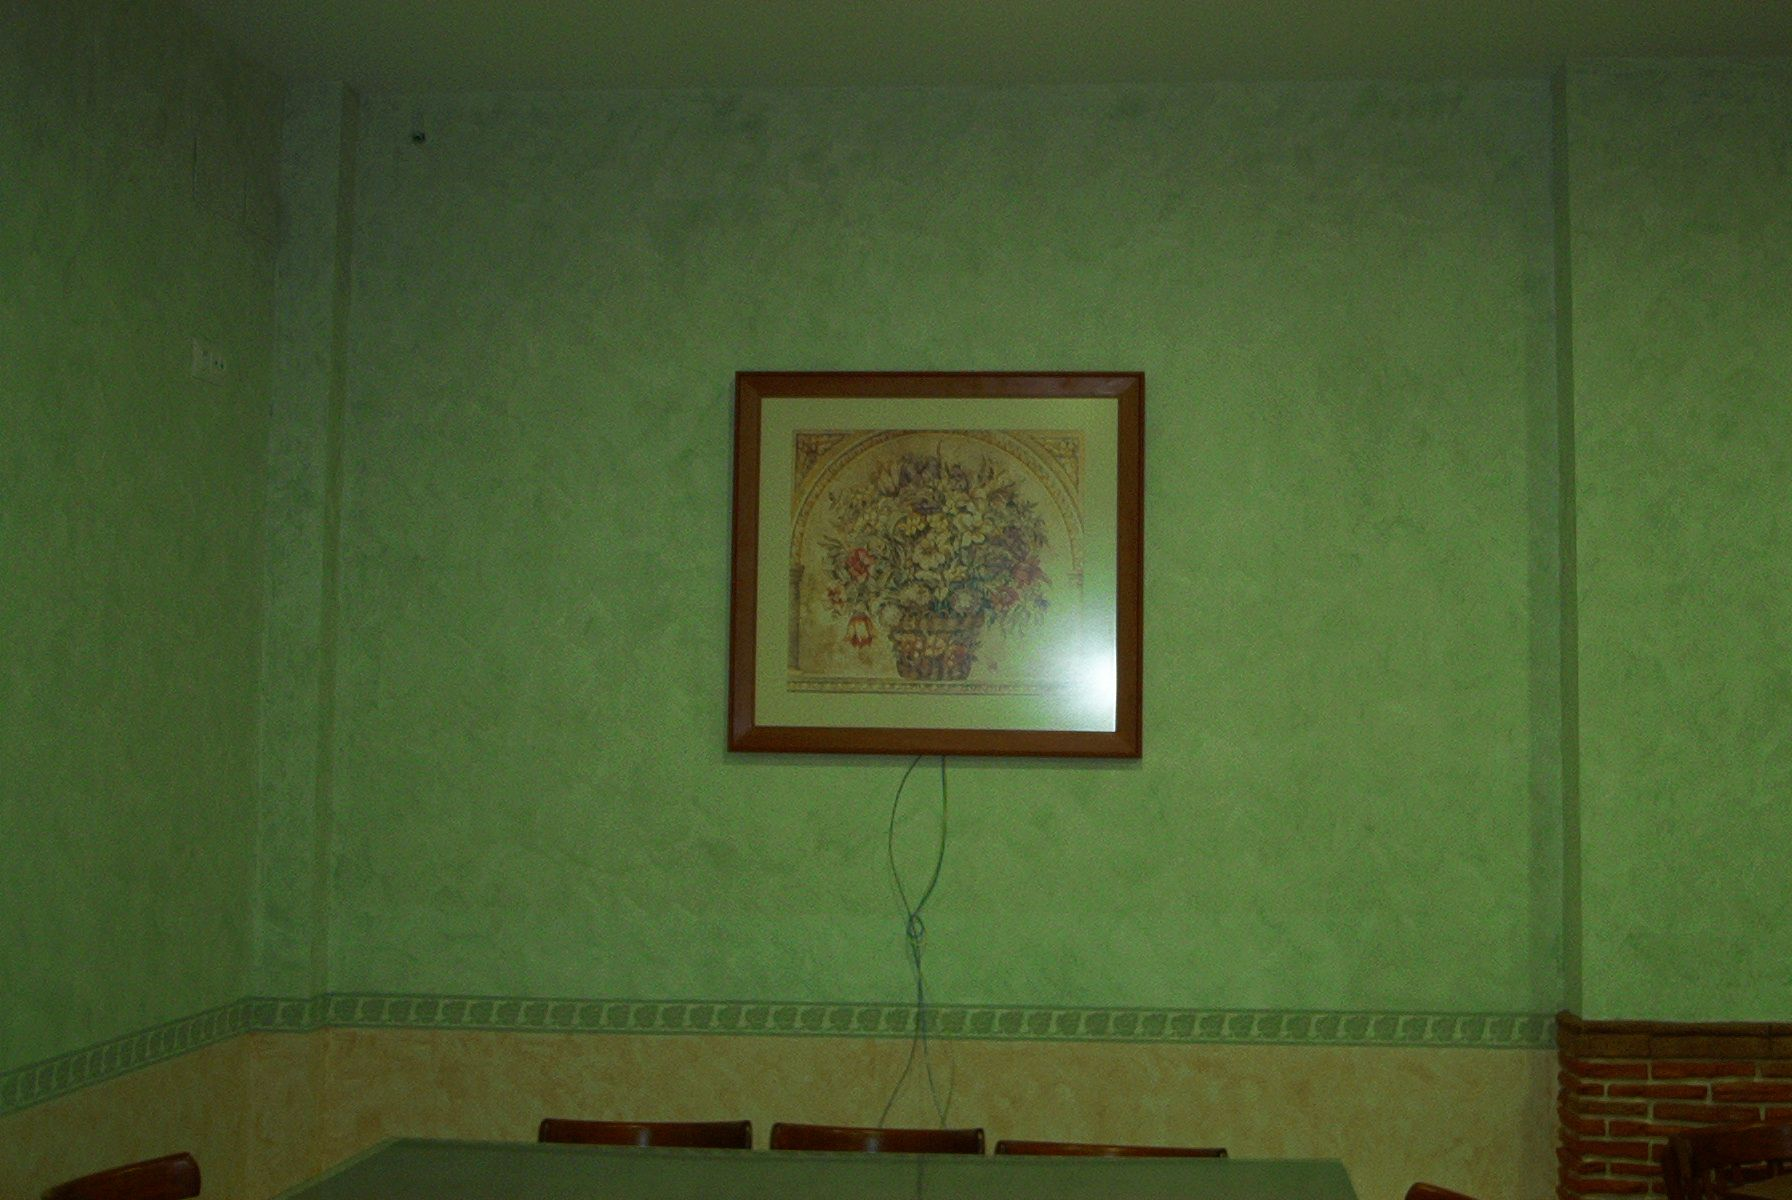 Aplicación de pinturas decorativas